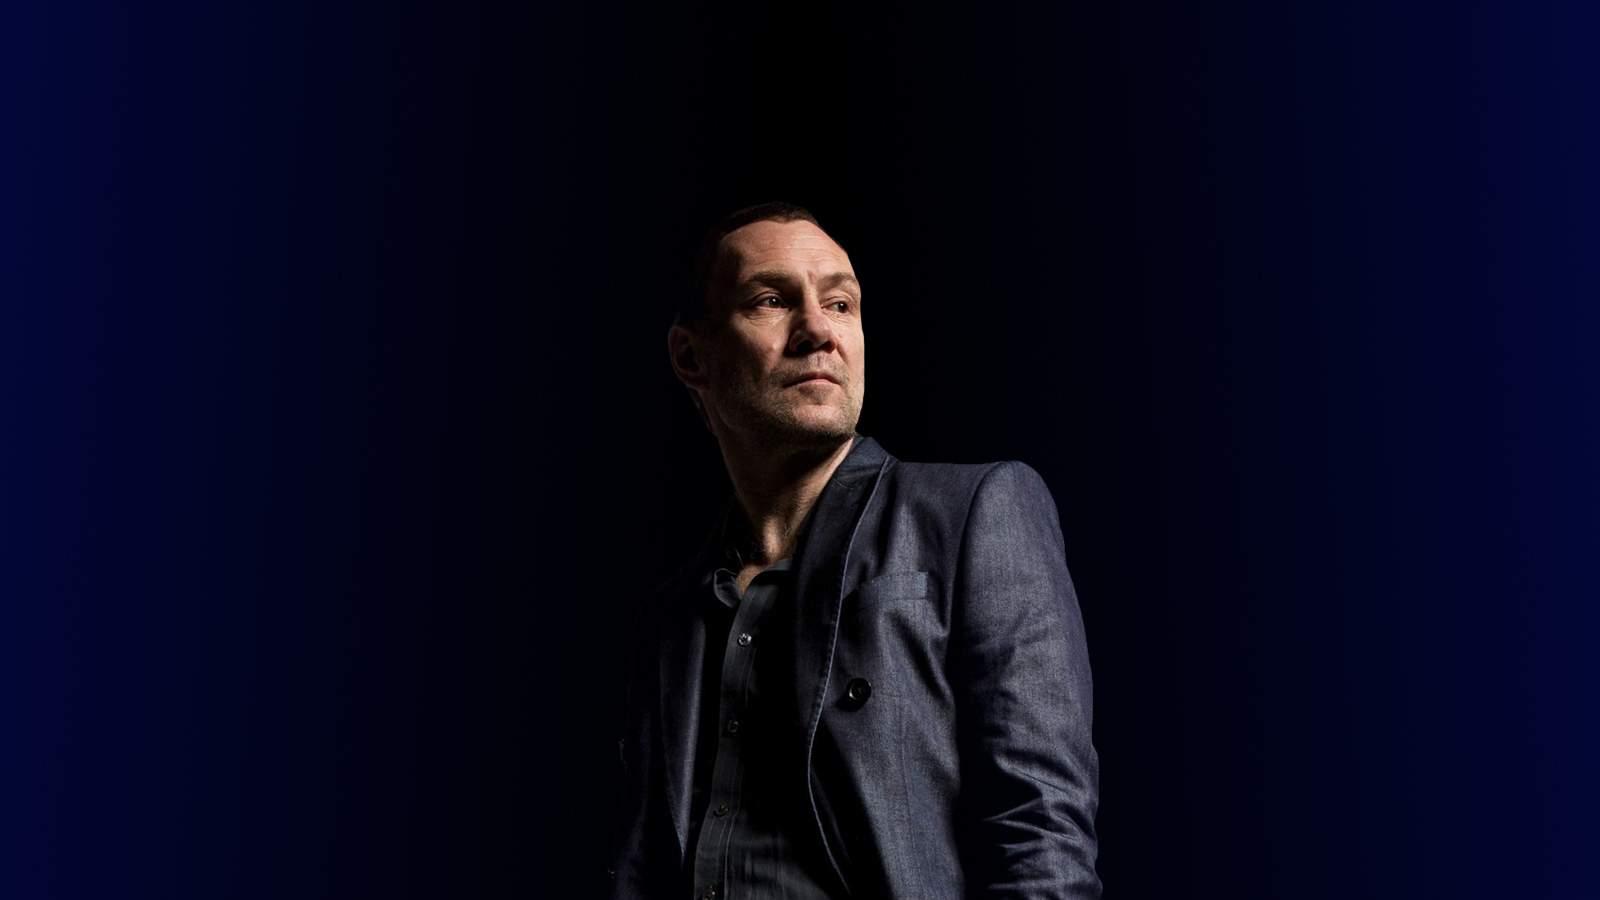 David Gray (Rescheduled from 7/14/2020)